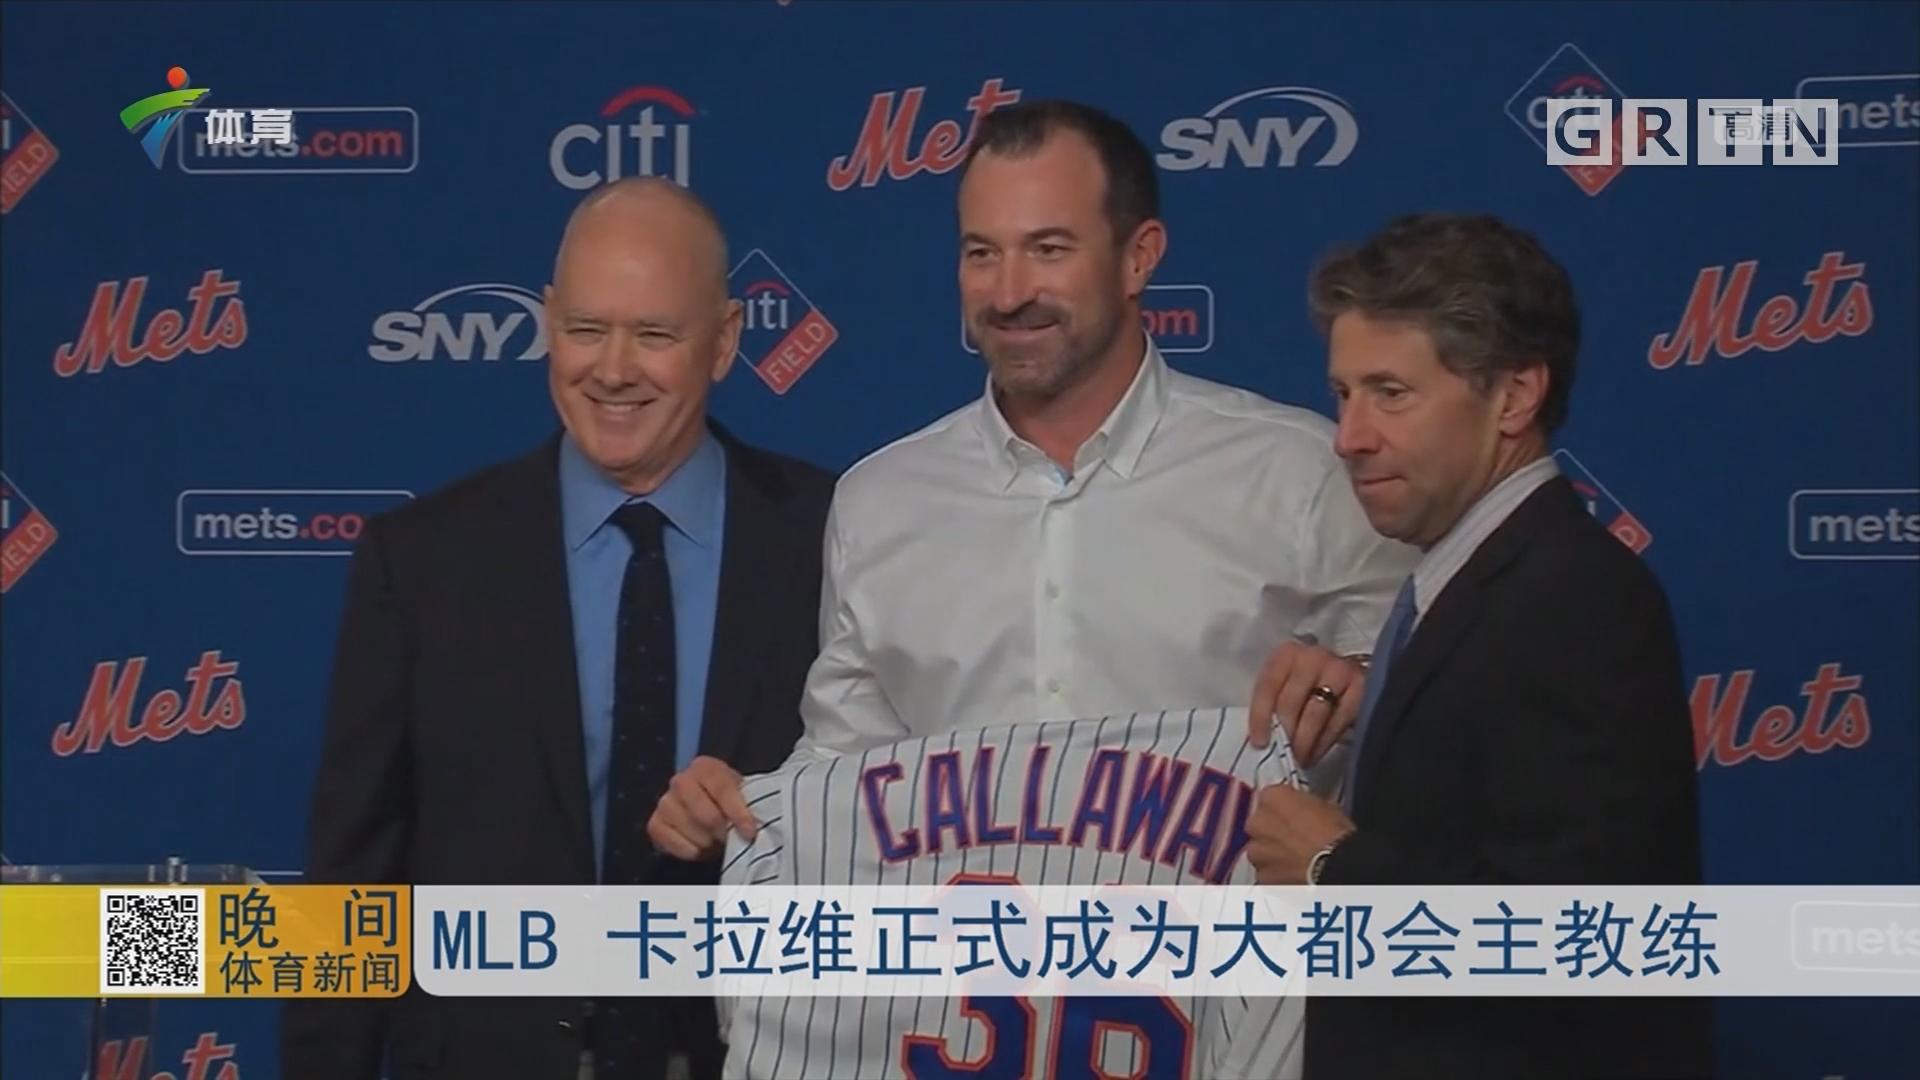 MLB 卡拉维正式成为大都会主教练